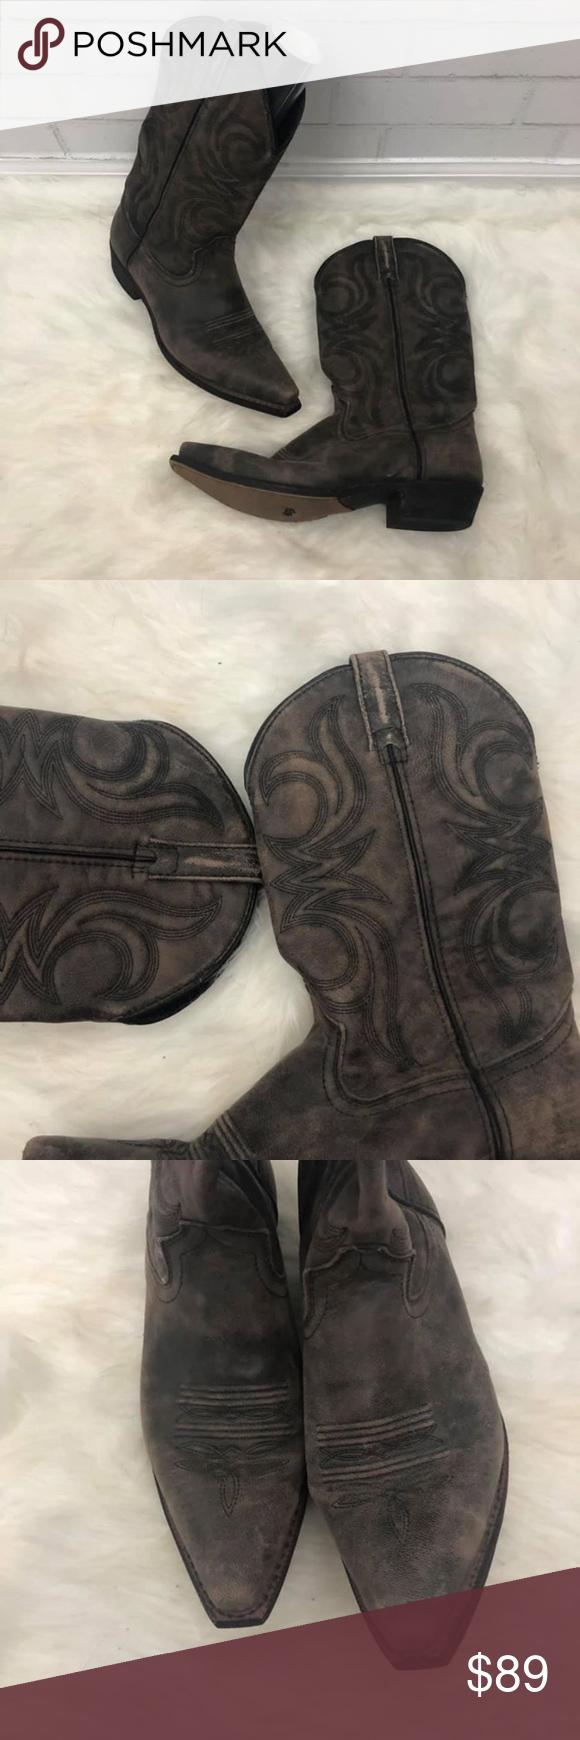 Men's Dingo Wyldwood Brown Leather Cowboy Boots Dark brown